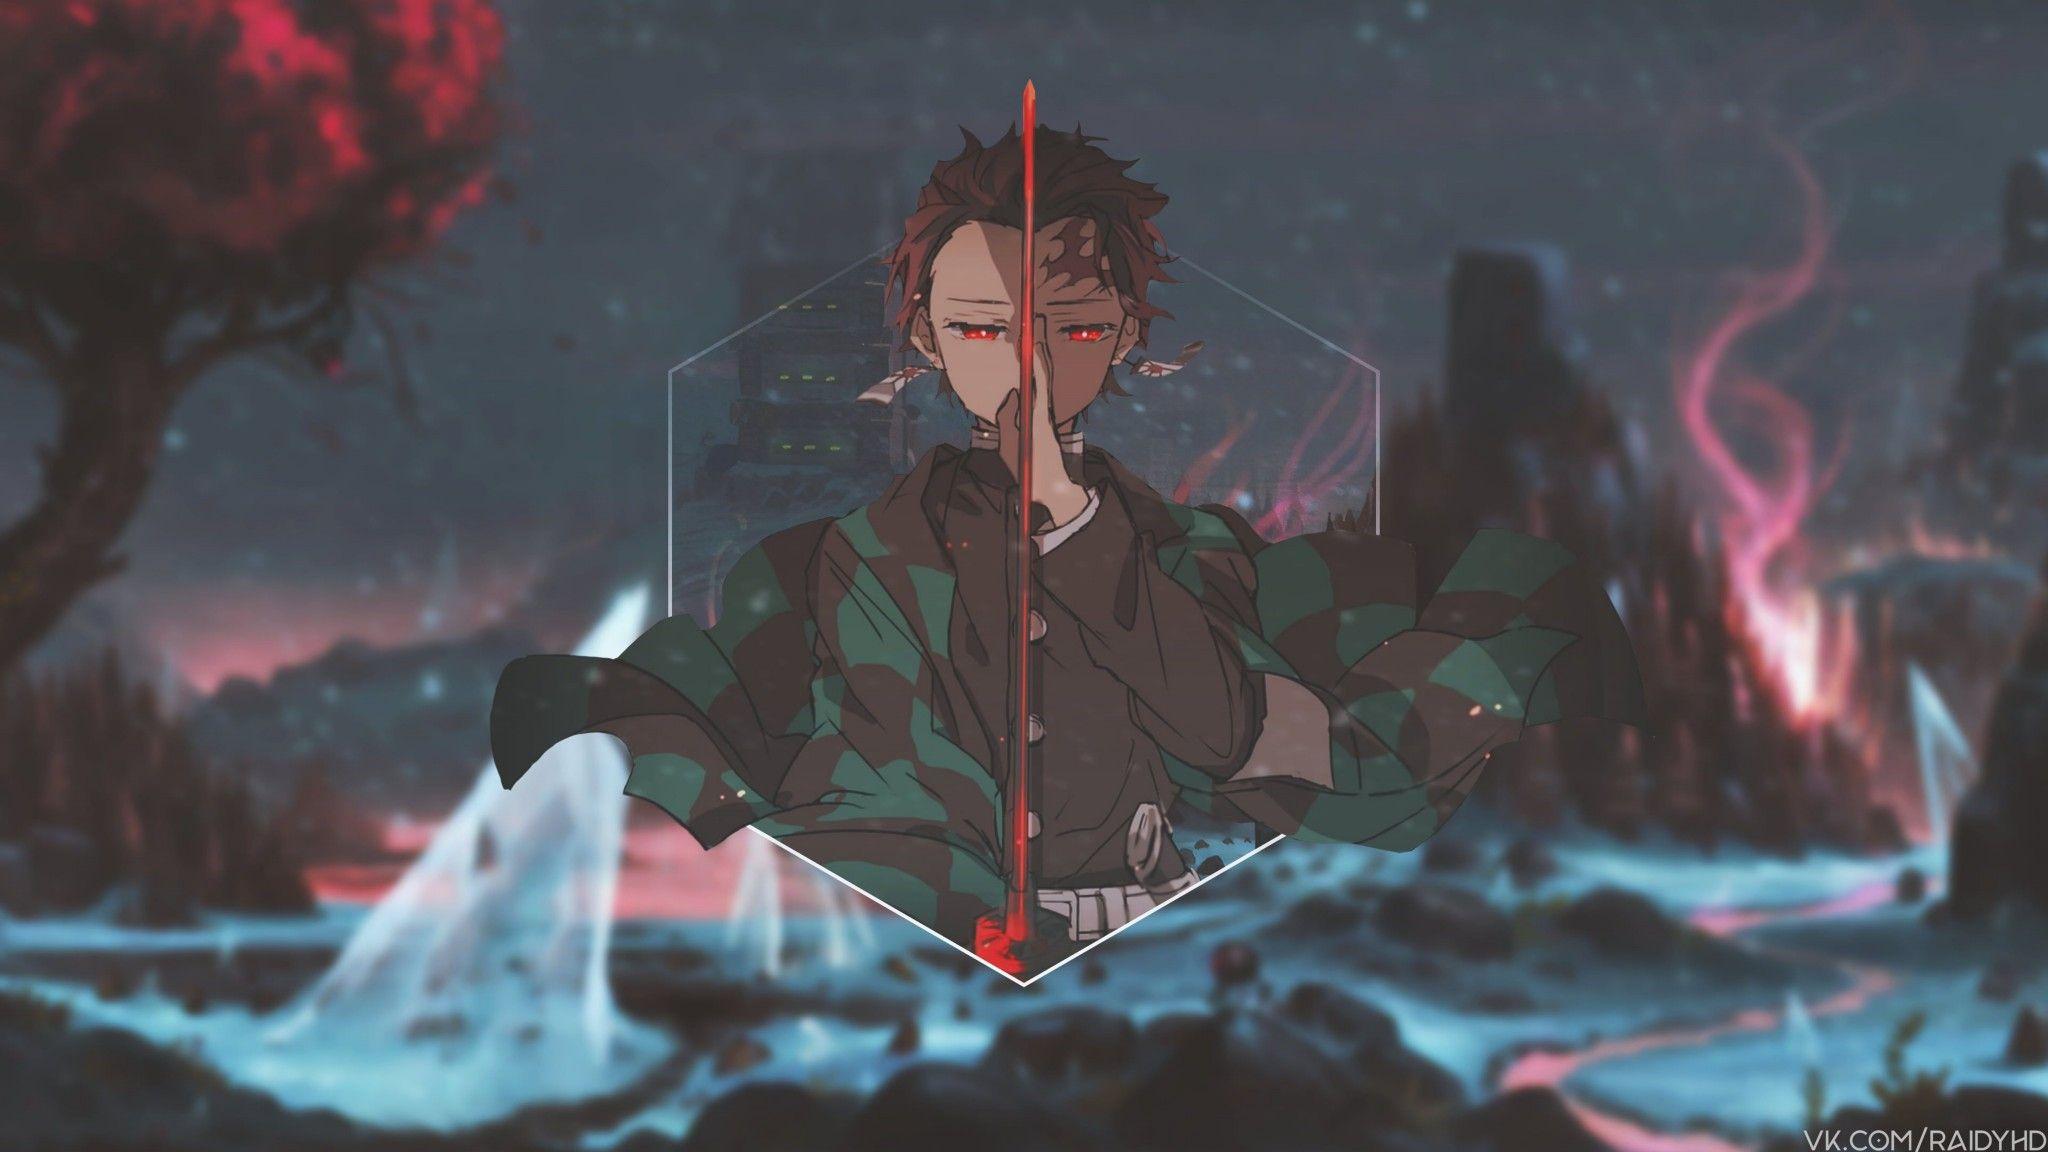 Tanjiroo In 2020 Anime Wallpaper Download Anime Wallpaper Anime Wallpaper 1920x1080